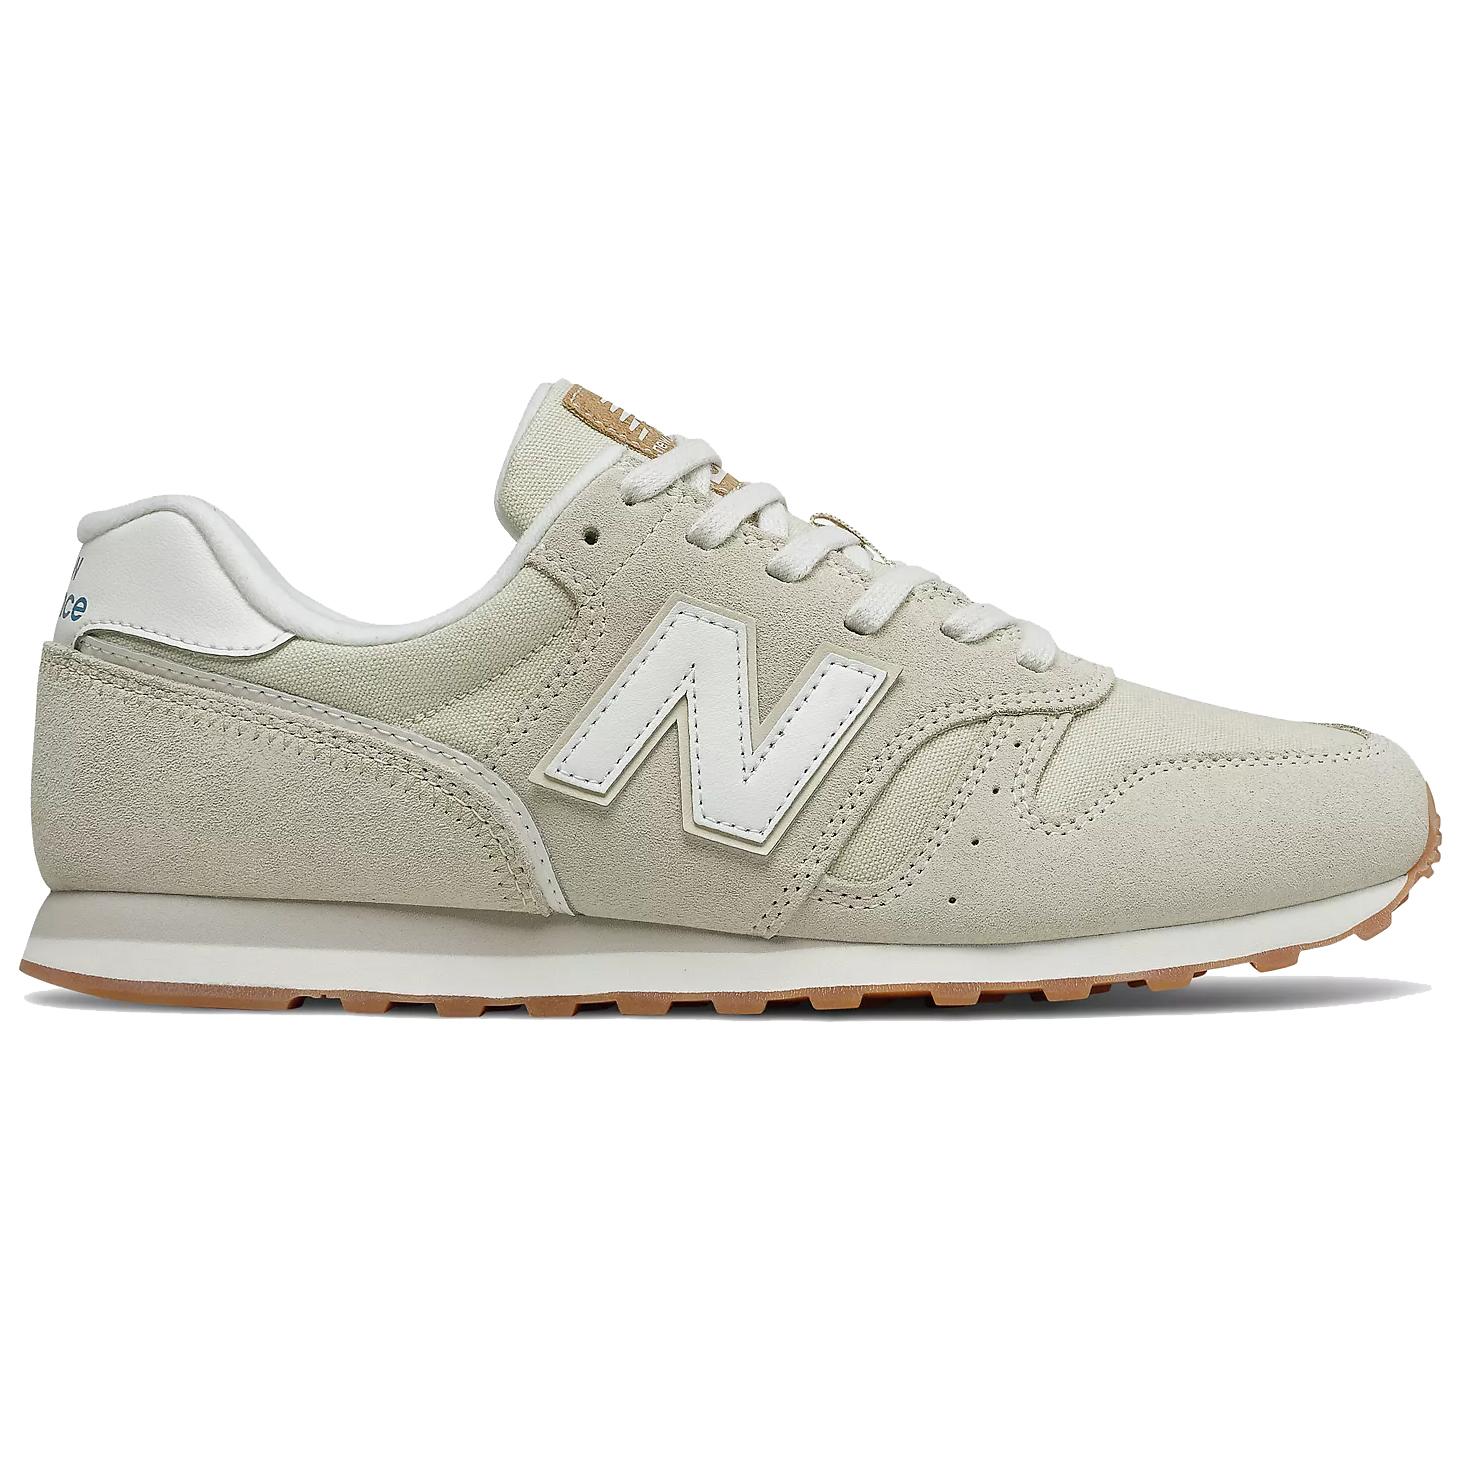 New Balance ML373SO2 Herren Sneaker beige weiß